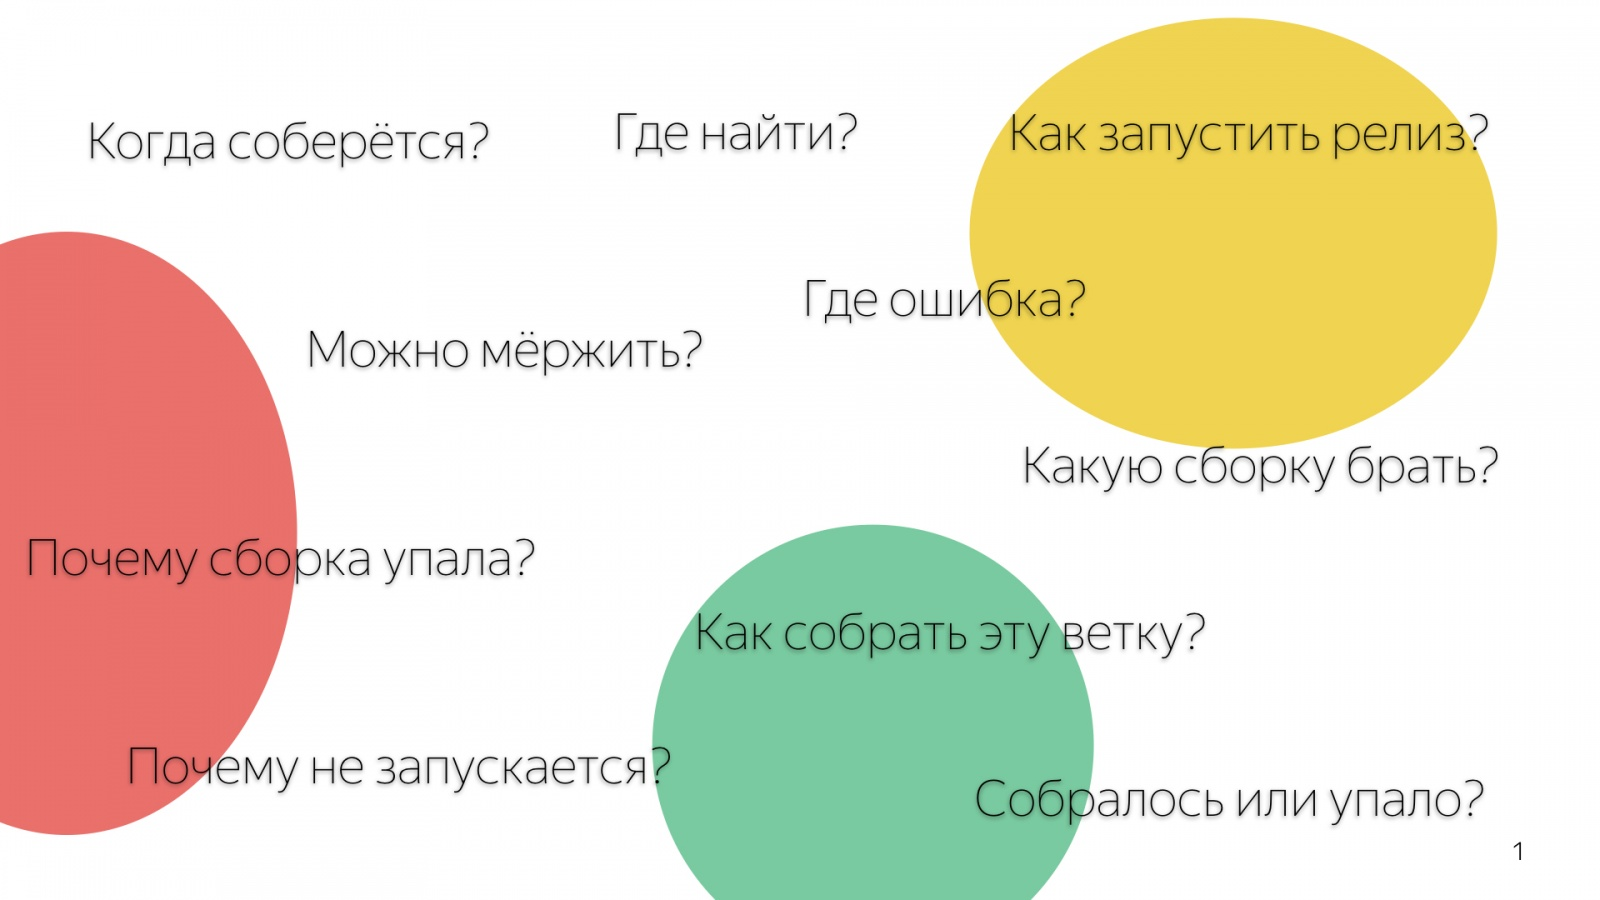 Рецепты TeamCity. Доклад Яндекс.Такси - 1